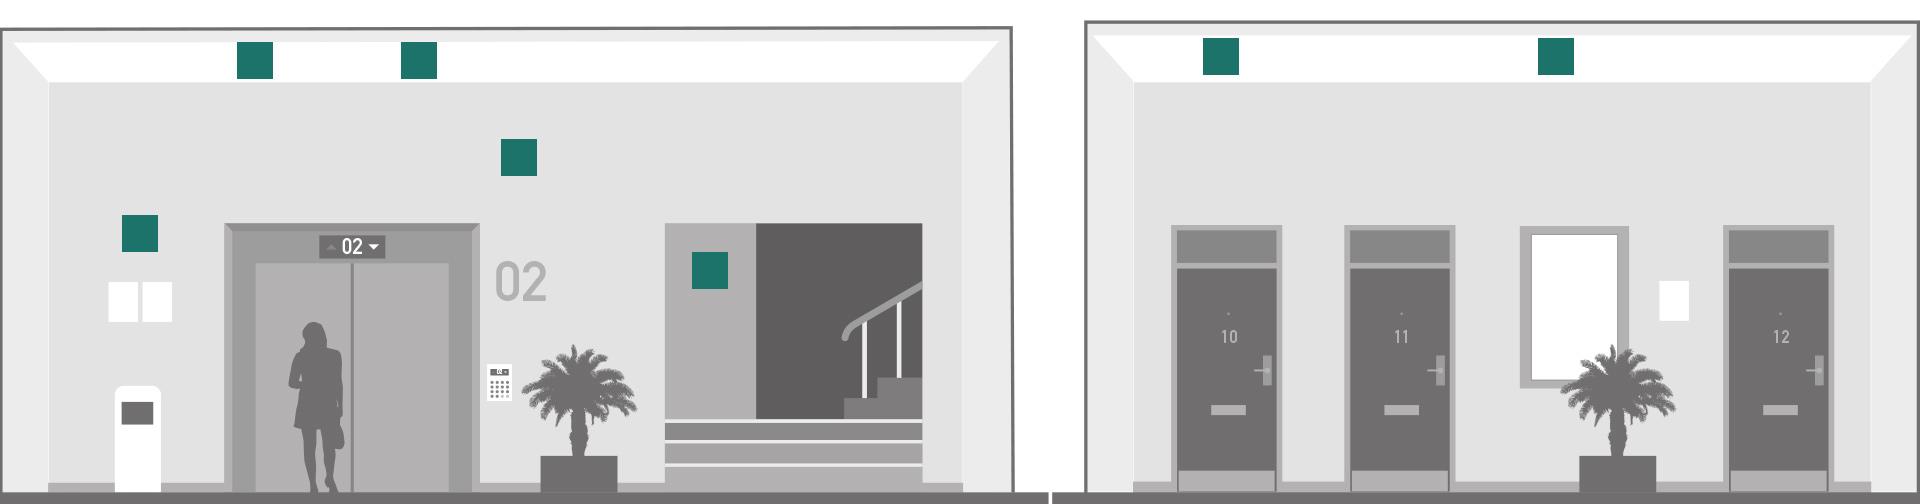 Community_Public_applications_foyer_interior